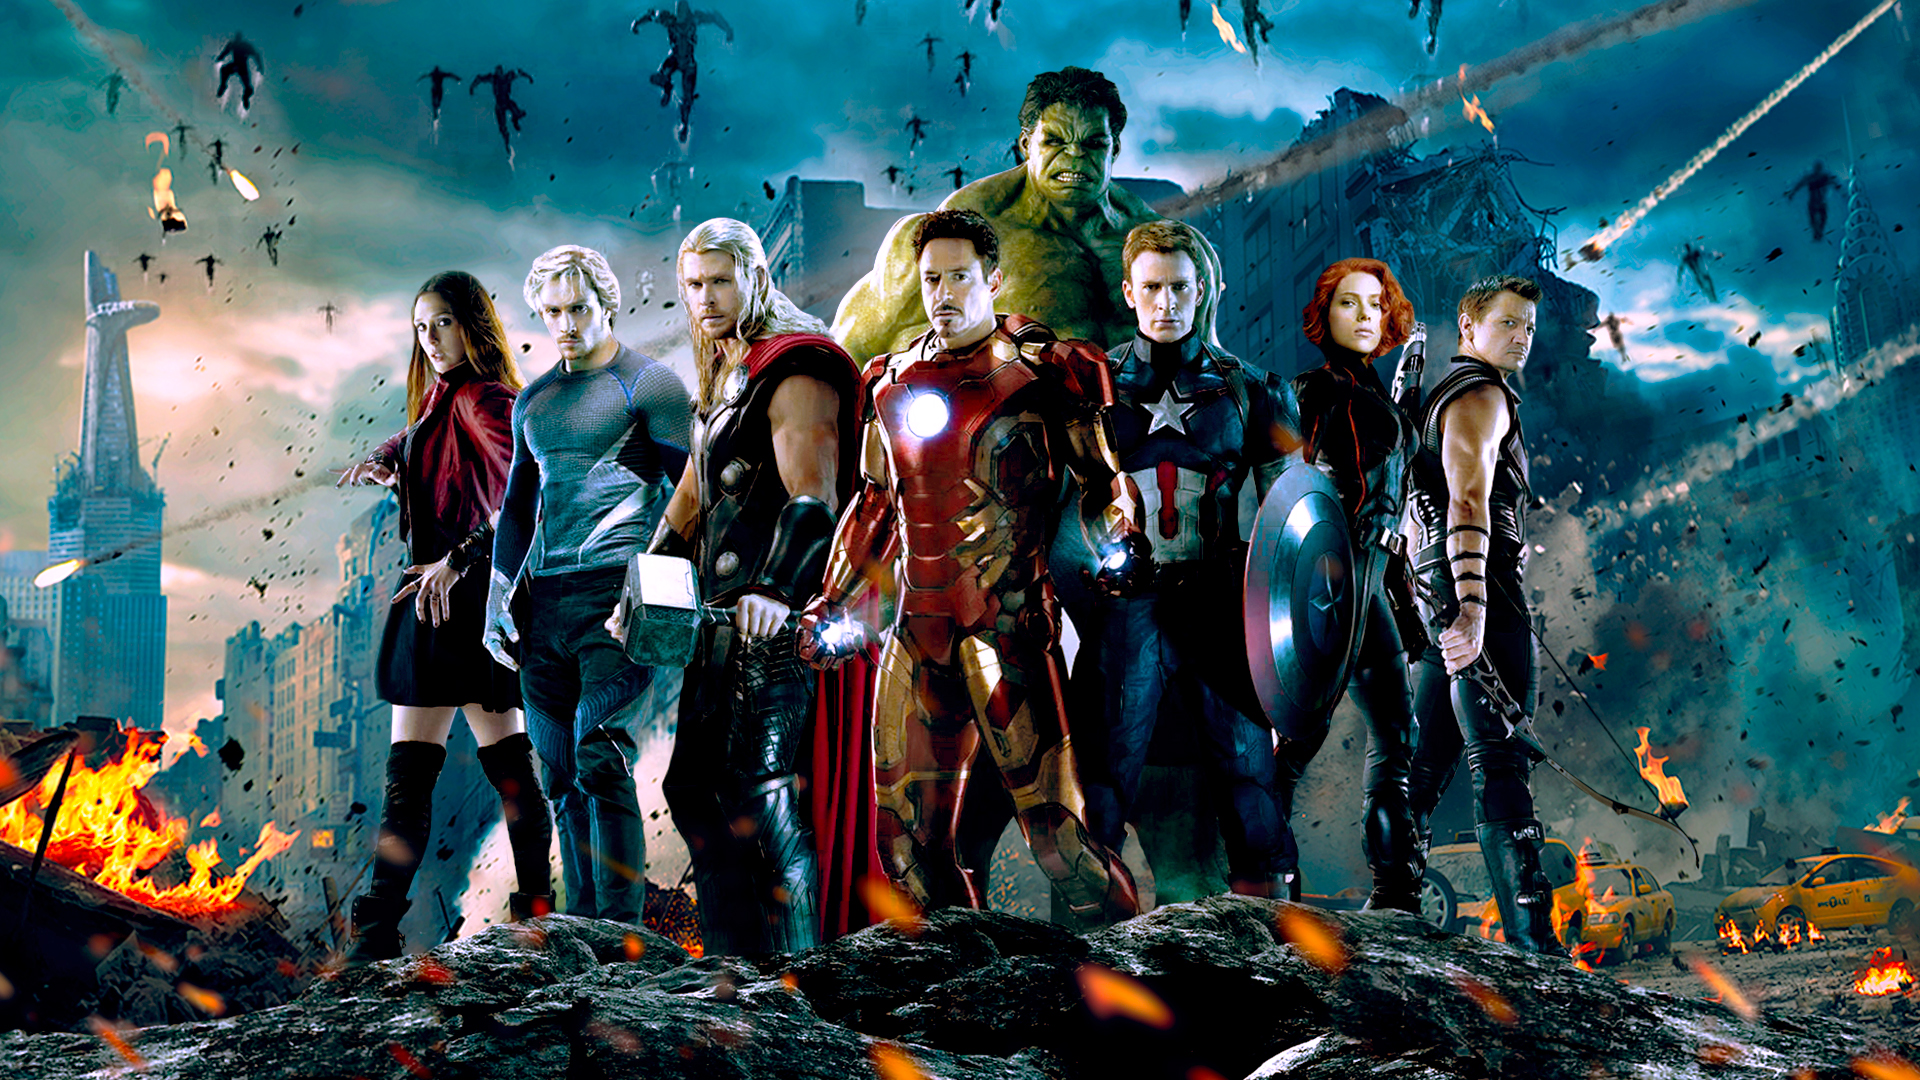 Avengers Wallpaper 1920x1080 by - 2638.9KB